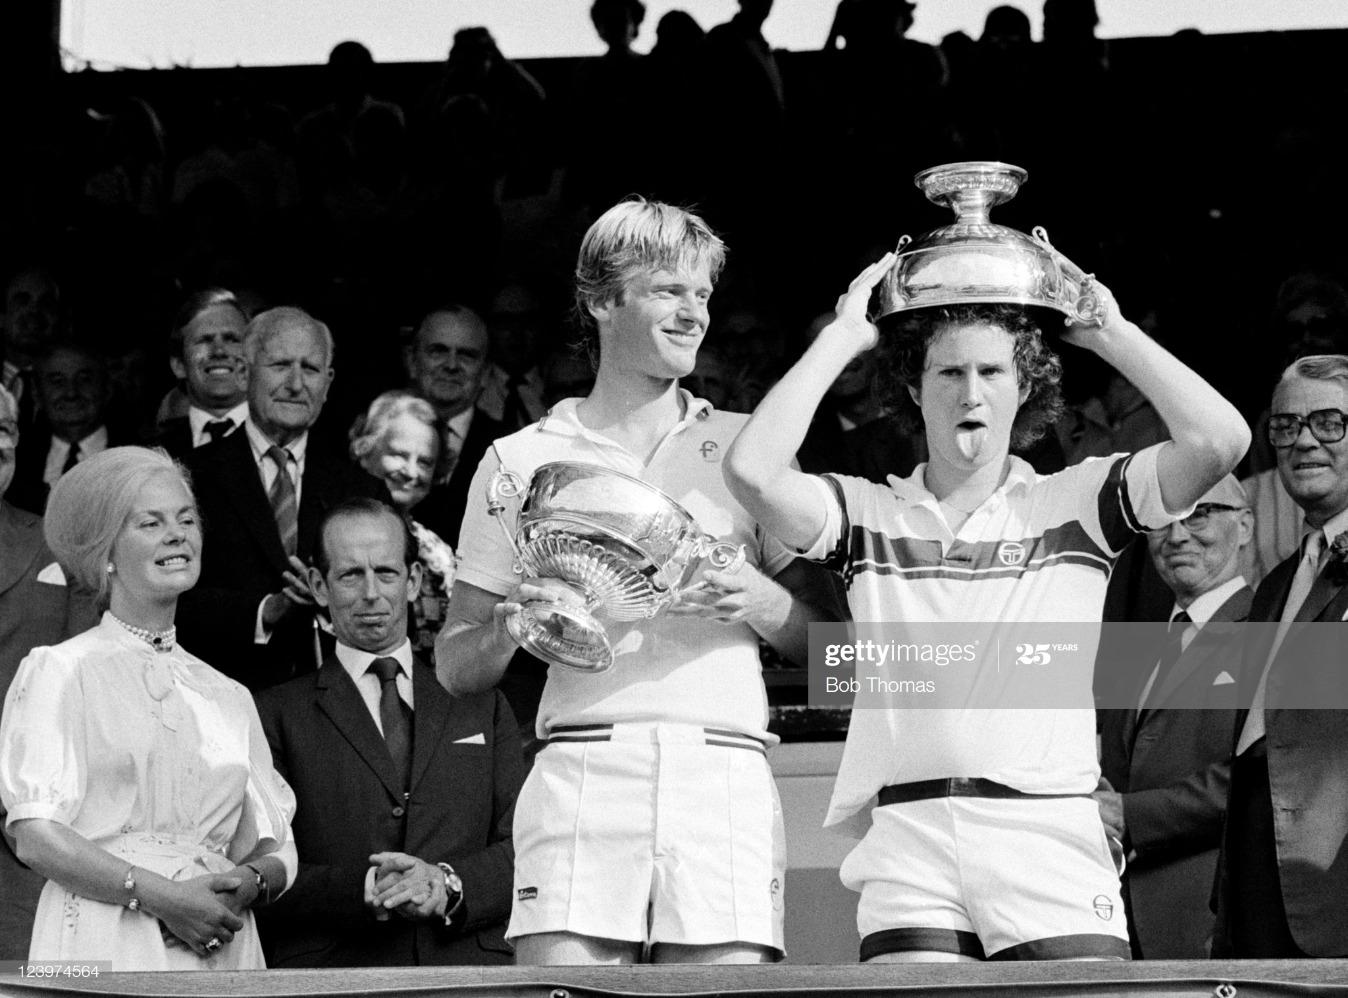 John McEnroe And Peter Fleming - Doubles Champions At Wimbledon : News Photo